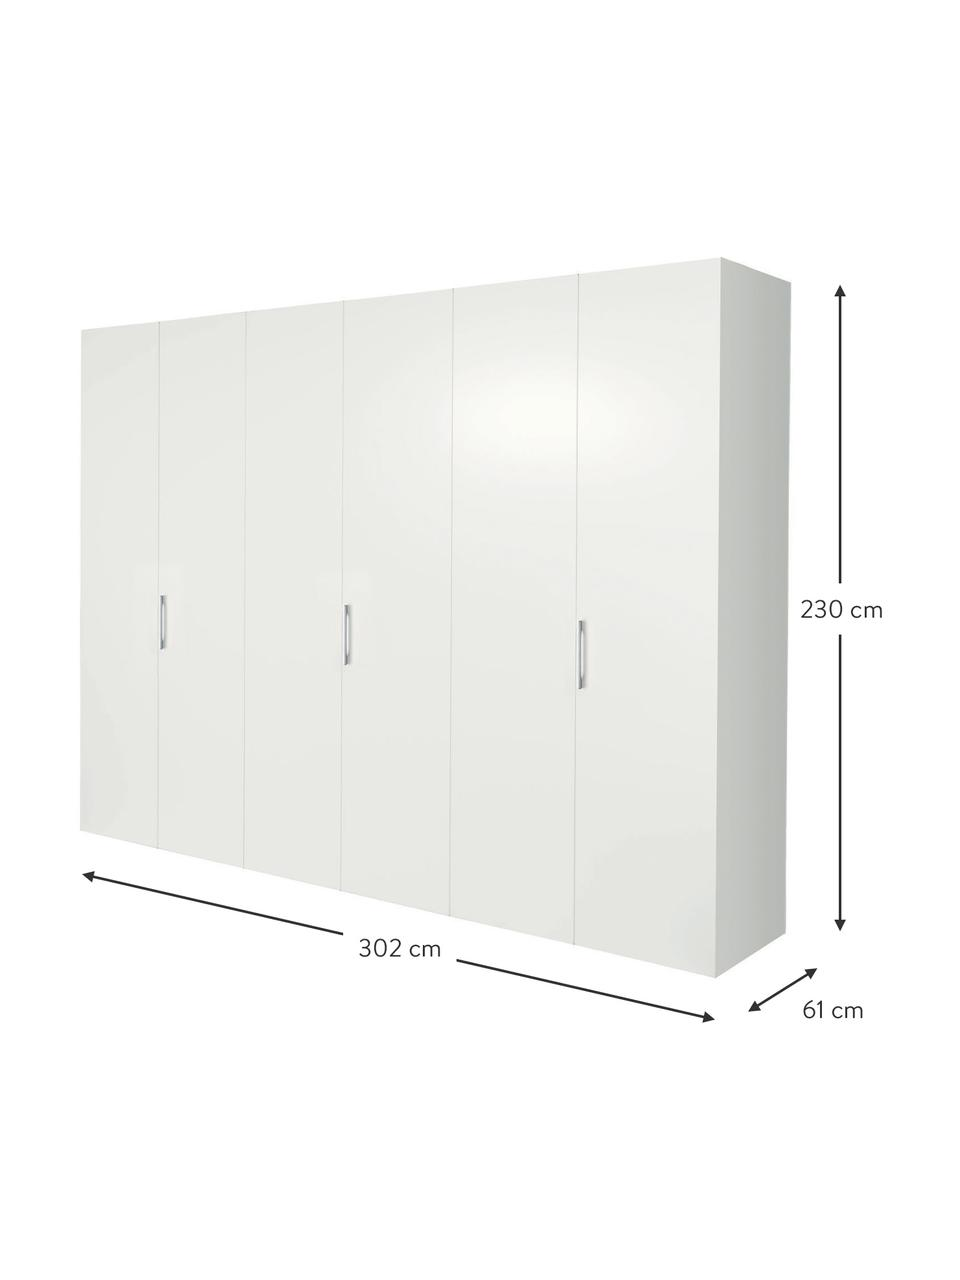 Witte kledingkast Madison, Frame: panelen op houtbasis, gel, Wit, 302 x 230 cm